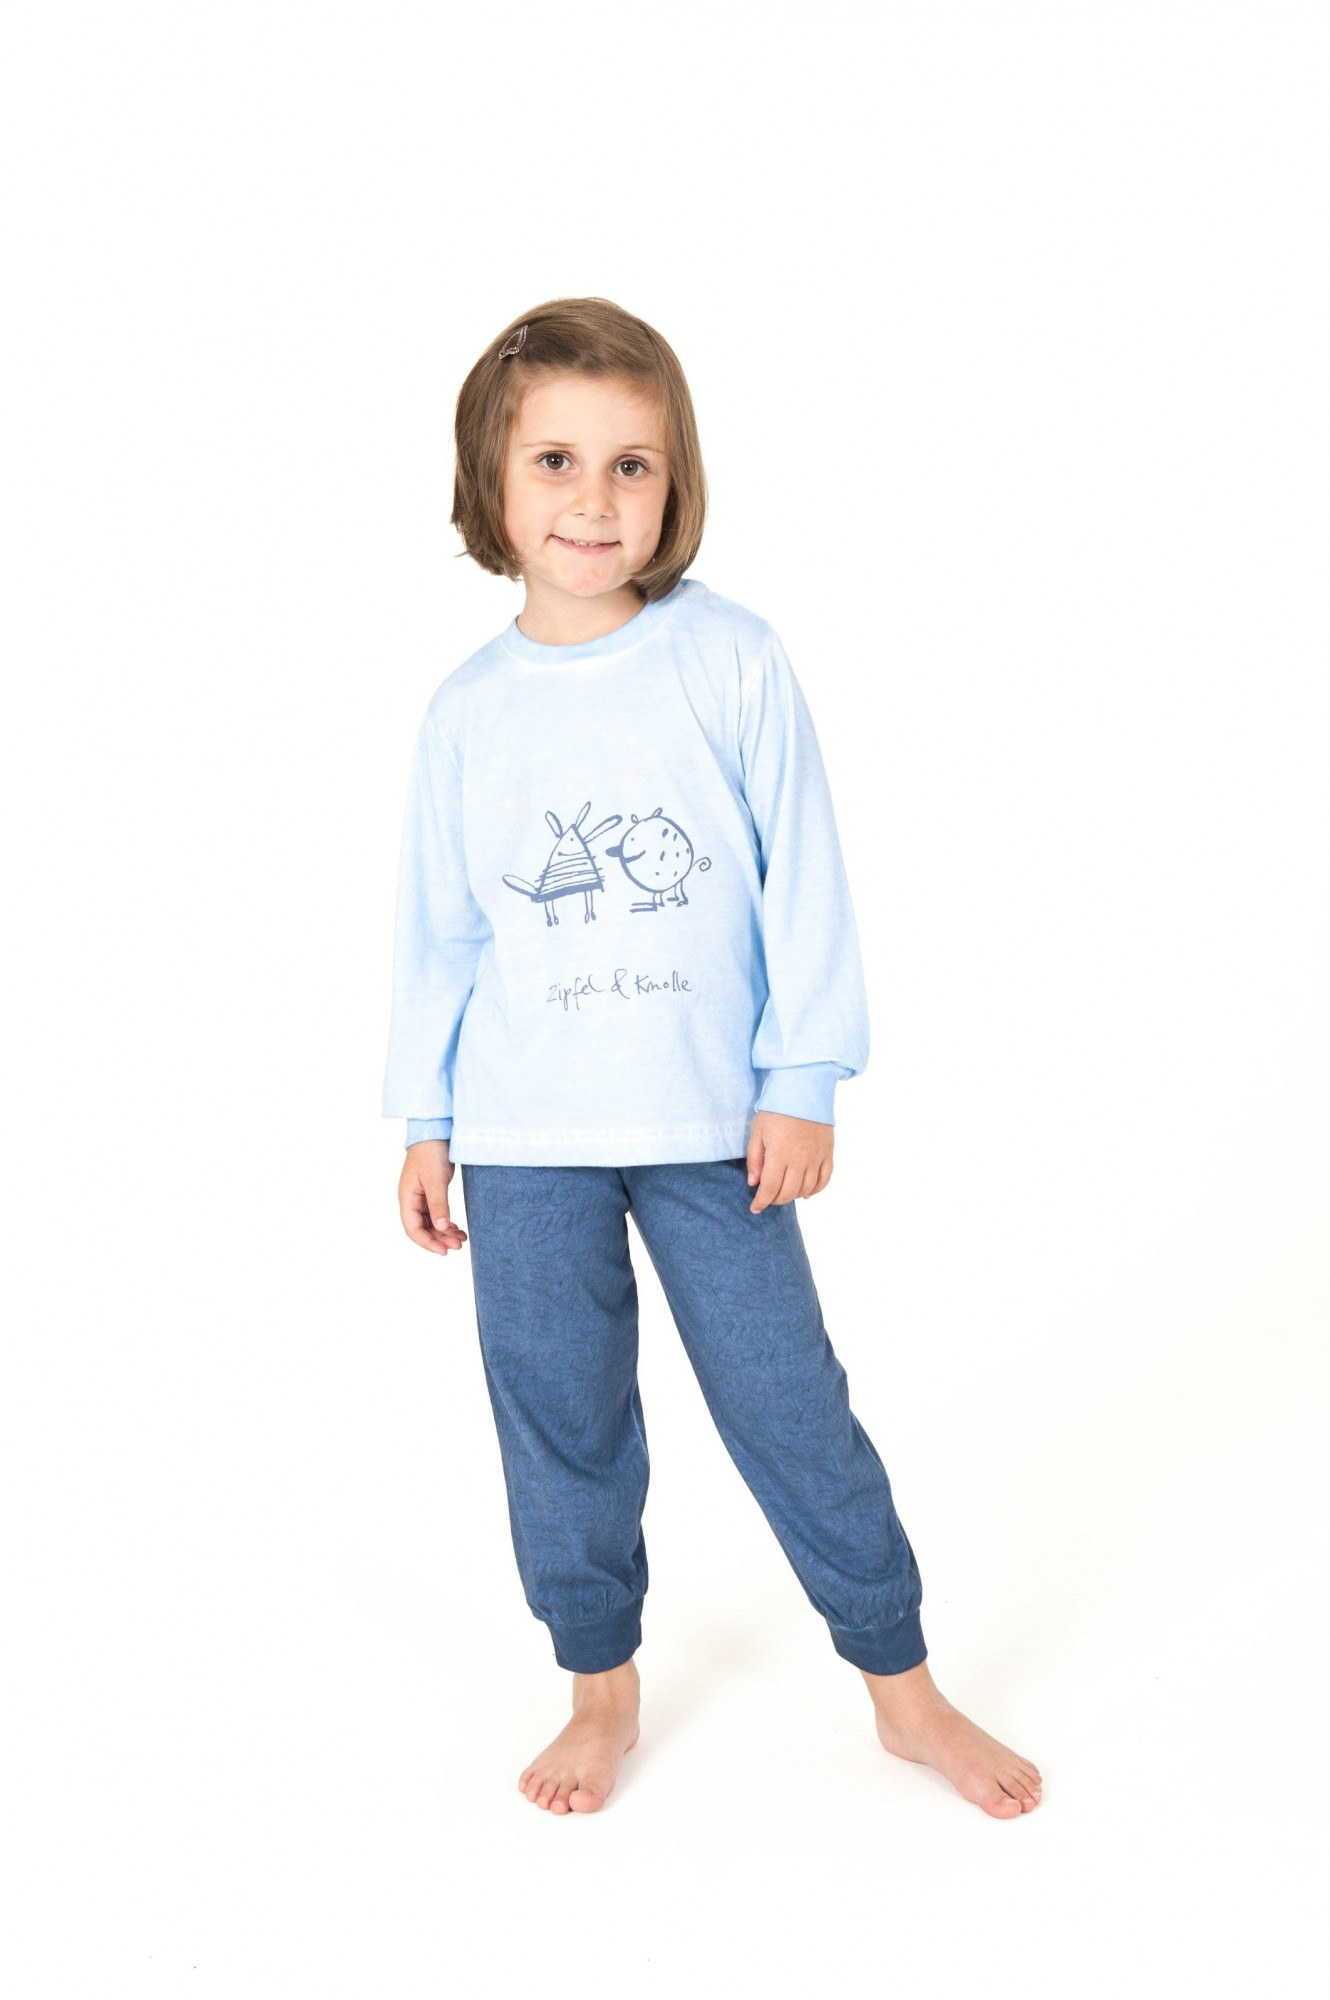 Cooler Mädchen Kinder Pyjama langarm – 161 701 90 840 – Bild 1